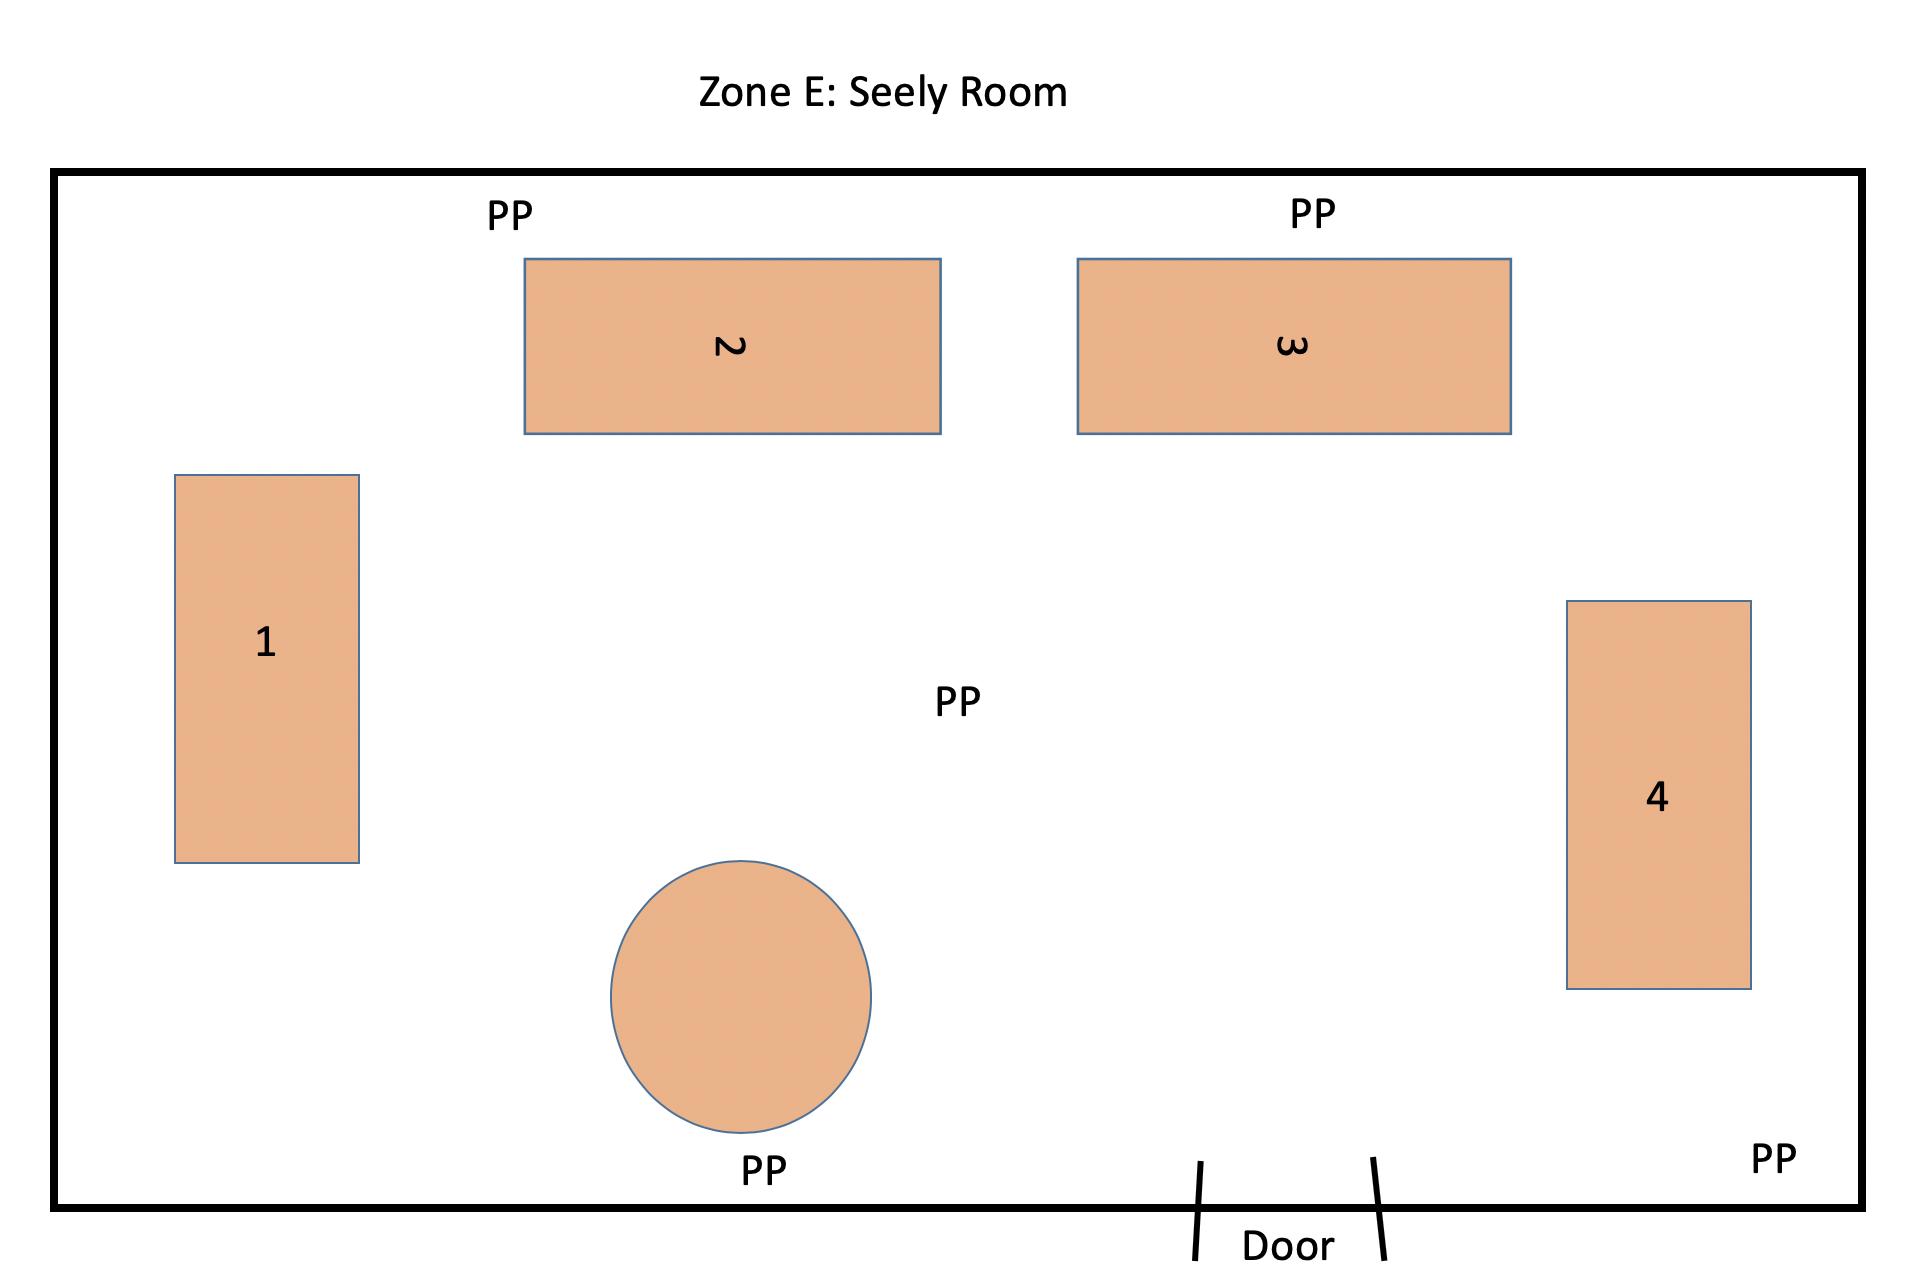 Zone E: Seely Room